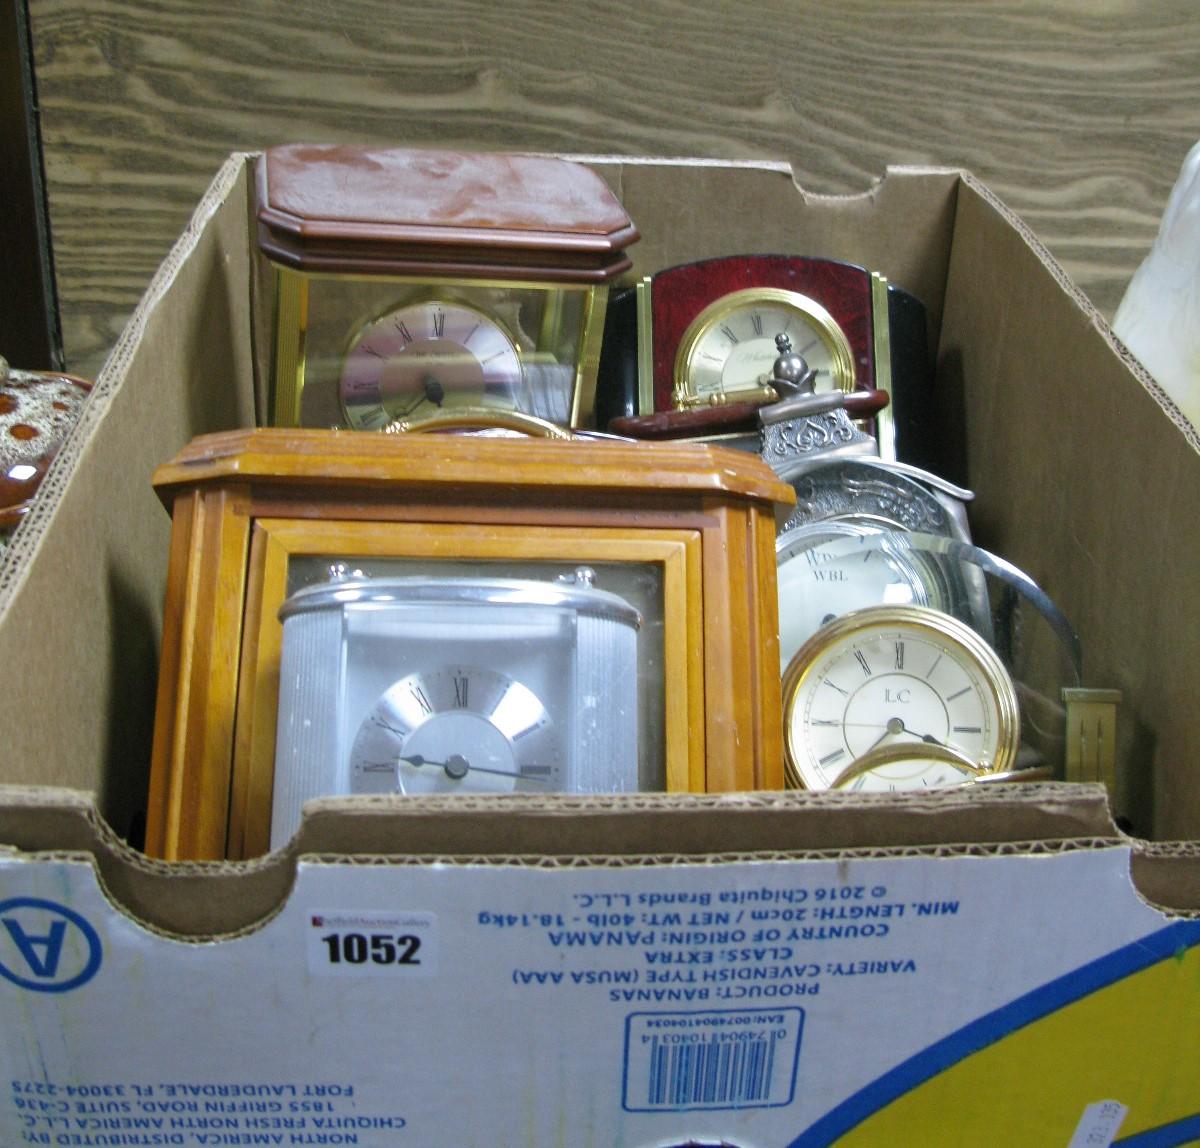 Lot 1052 - Acctim, Whitehall, WM Widdop, Seiko and Other Clocks:- One Box